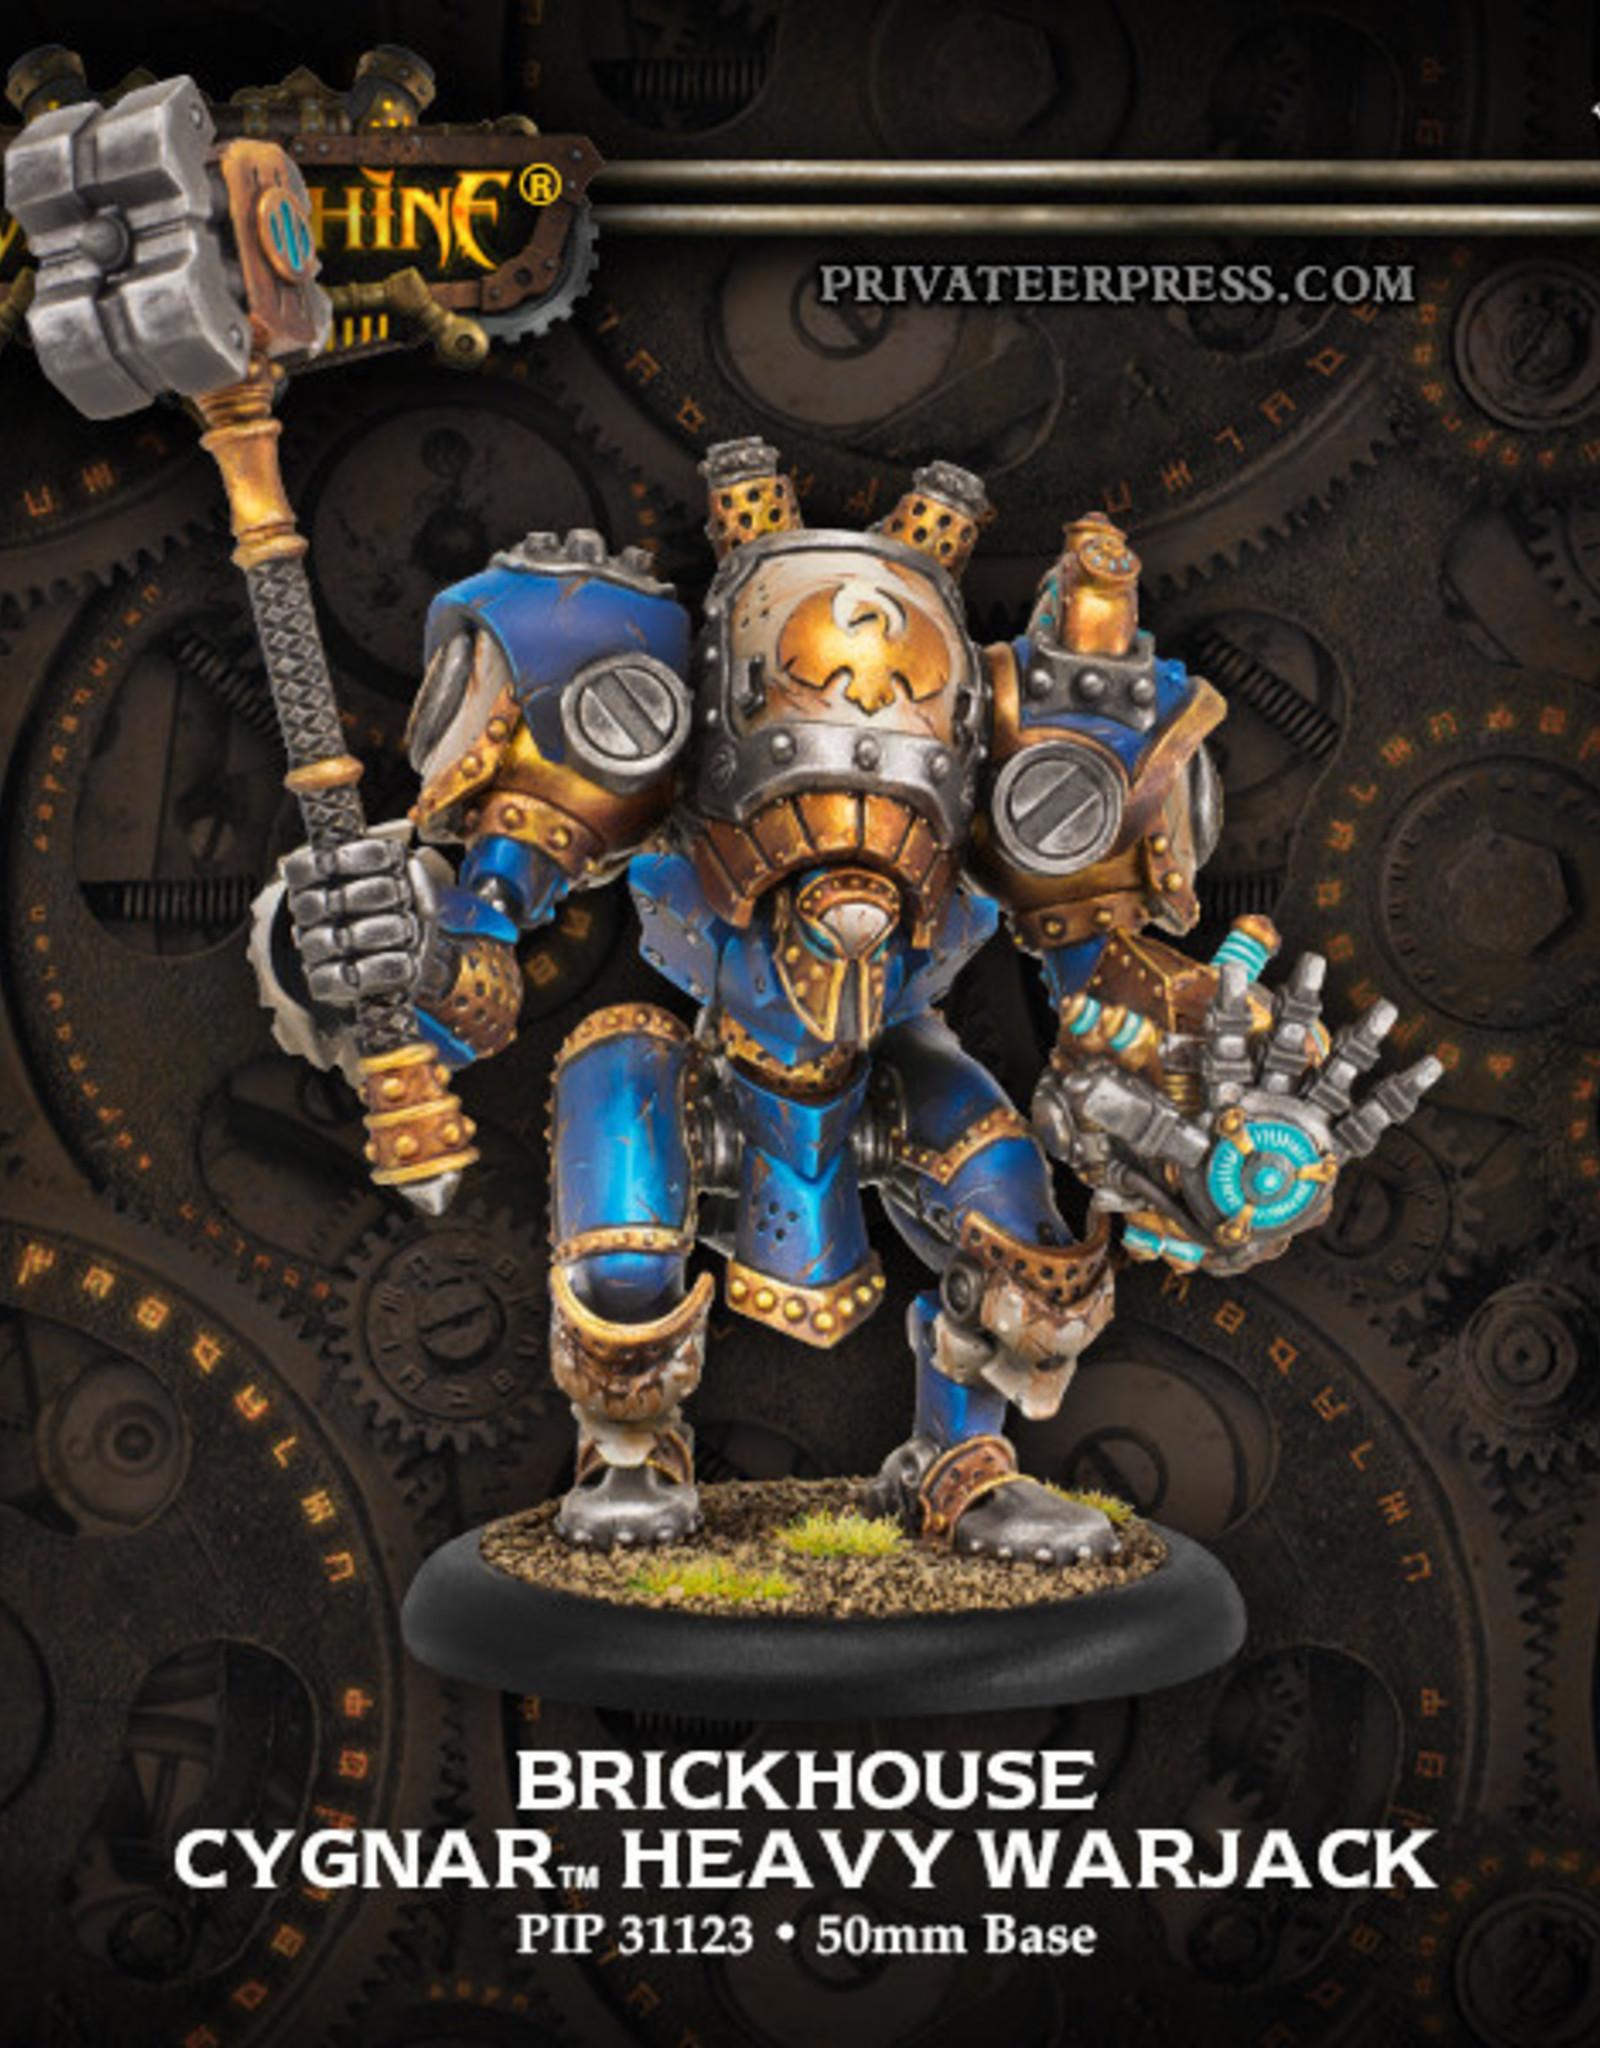 Warmachine Cygnar - Brickhouse